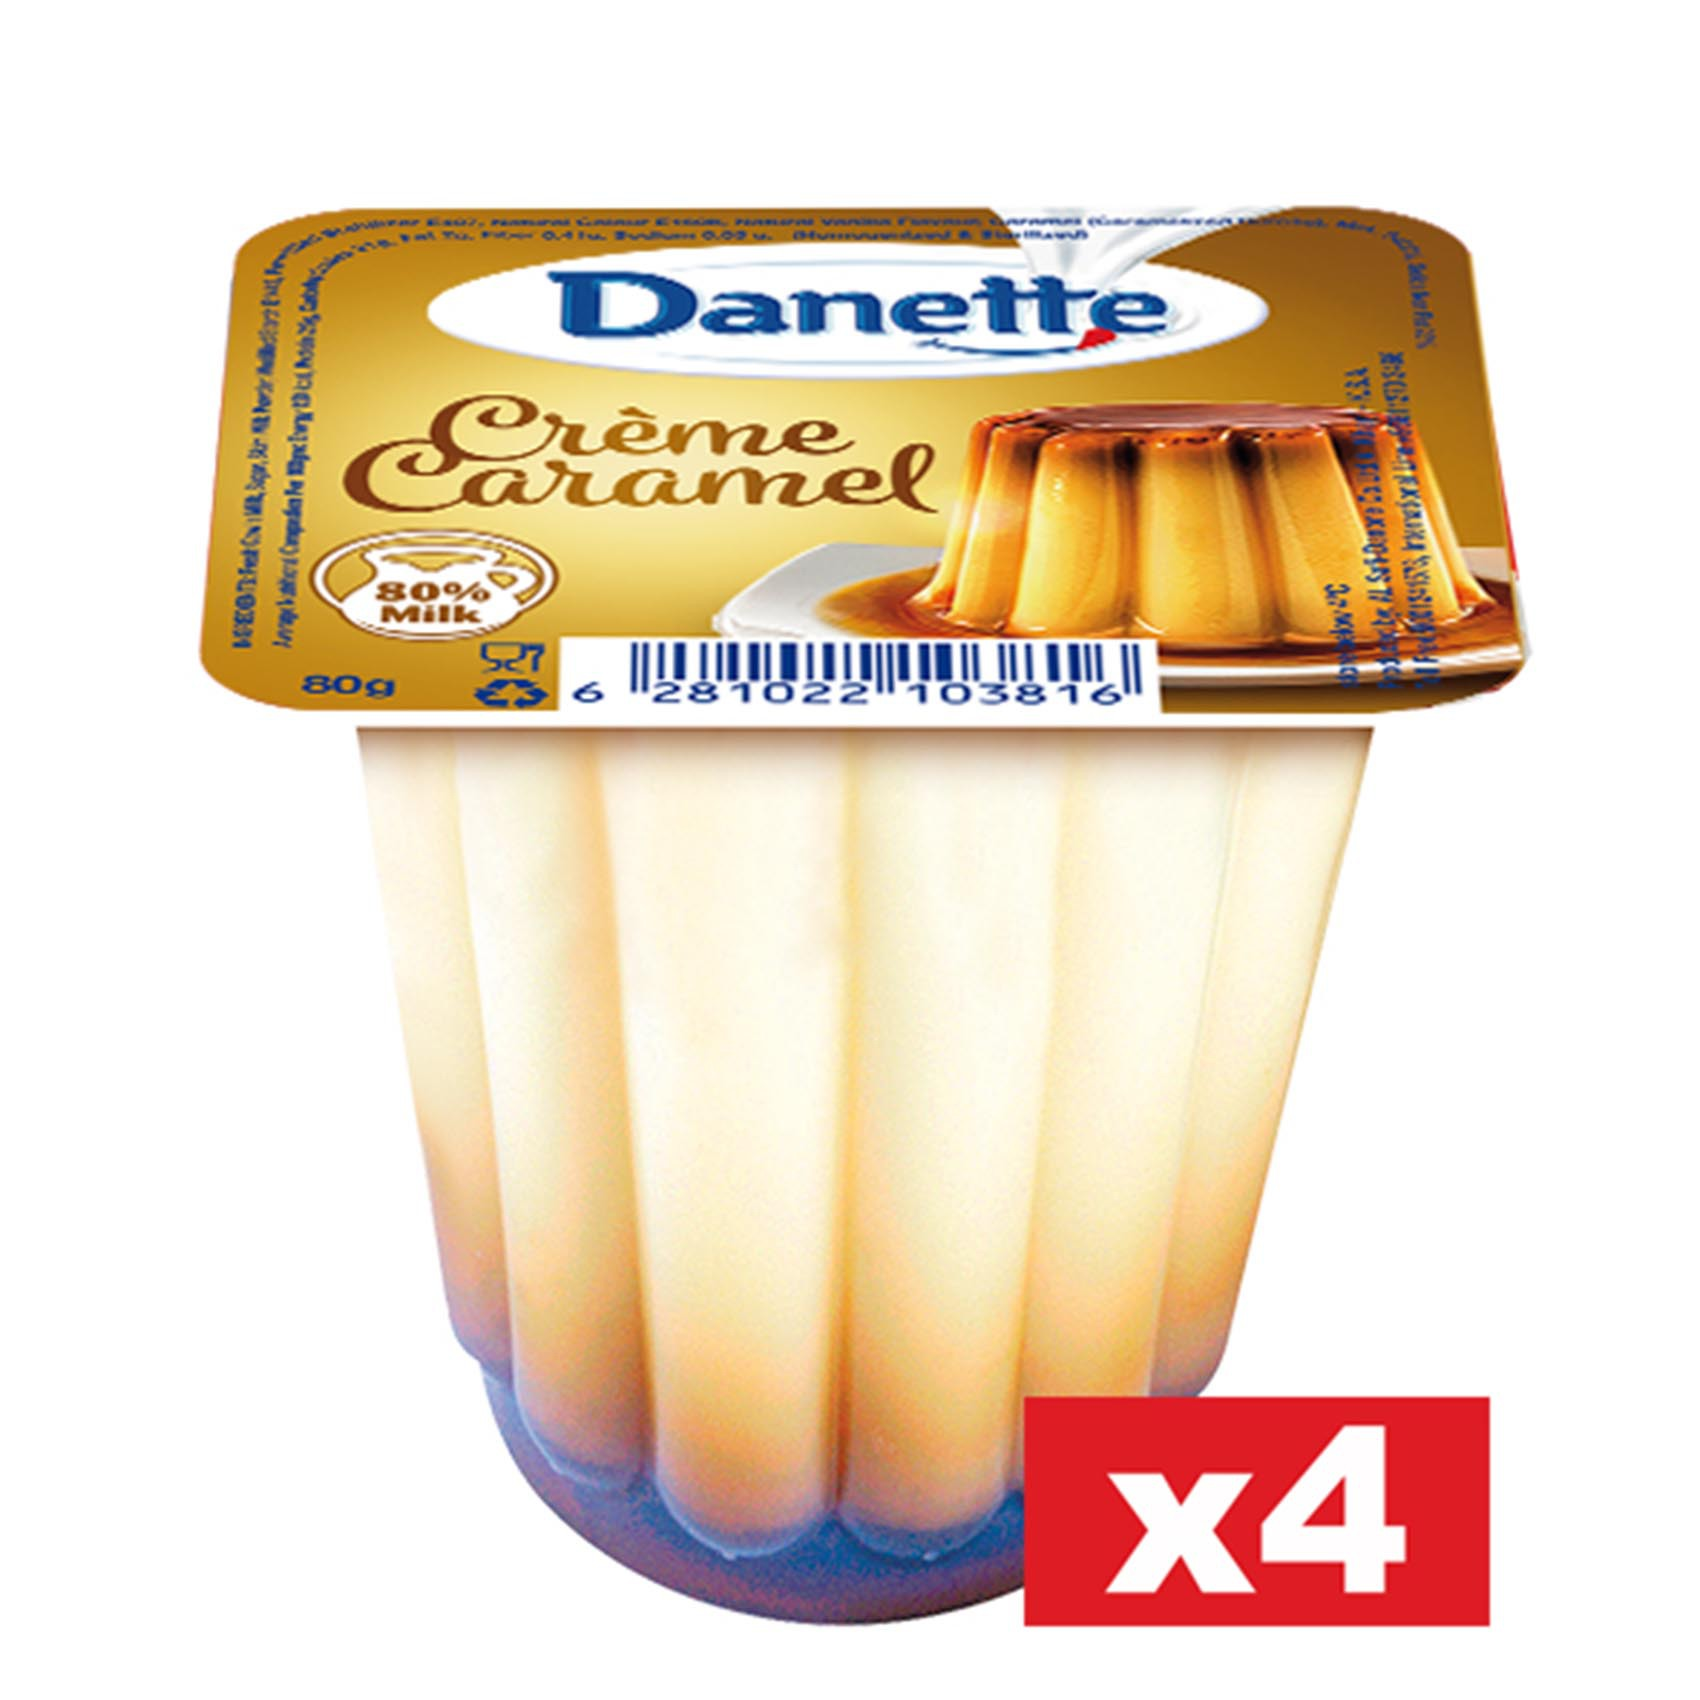 DANETTE CREAM CARAMEL 80GX4